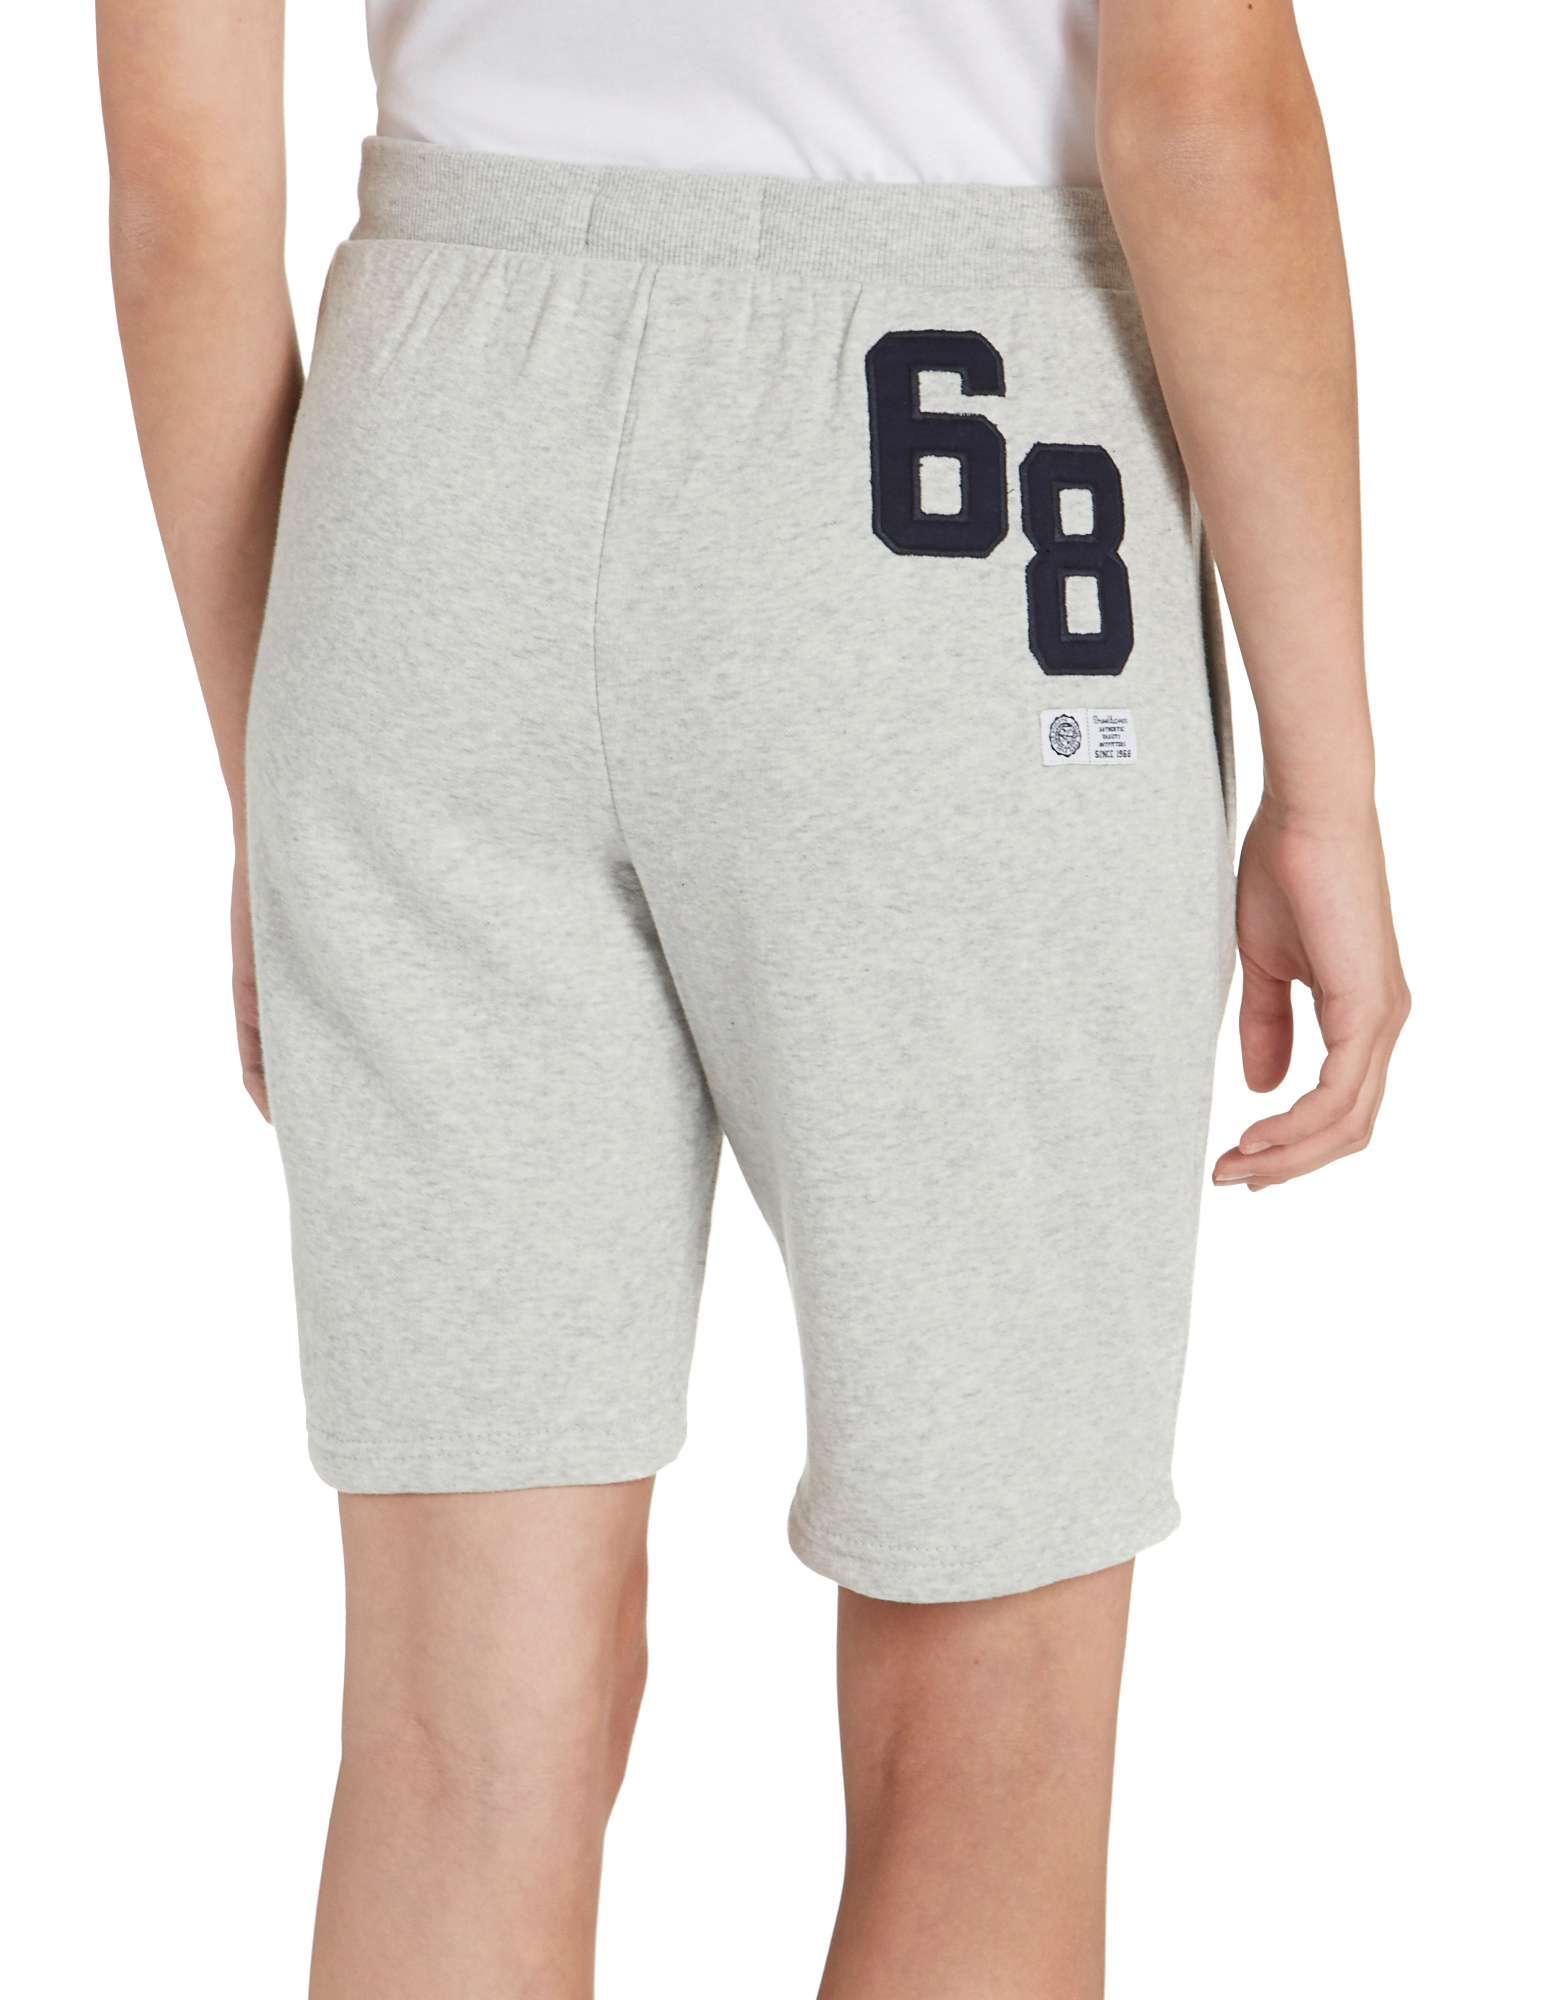 Brookhaven Ashleigh Jogging Shorts